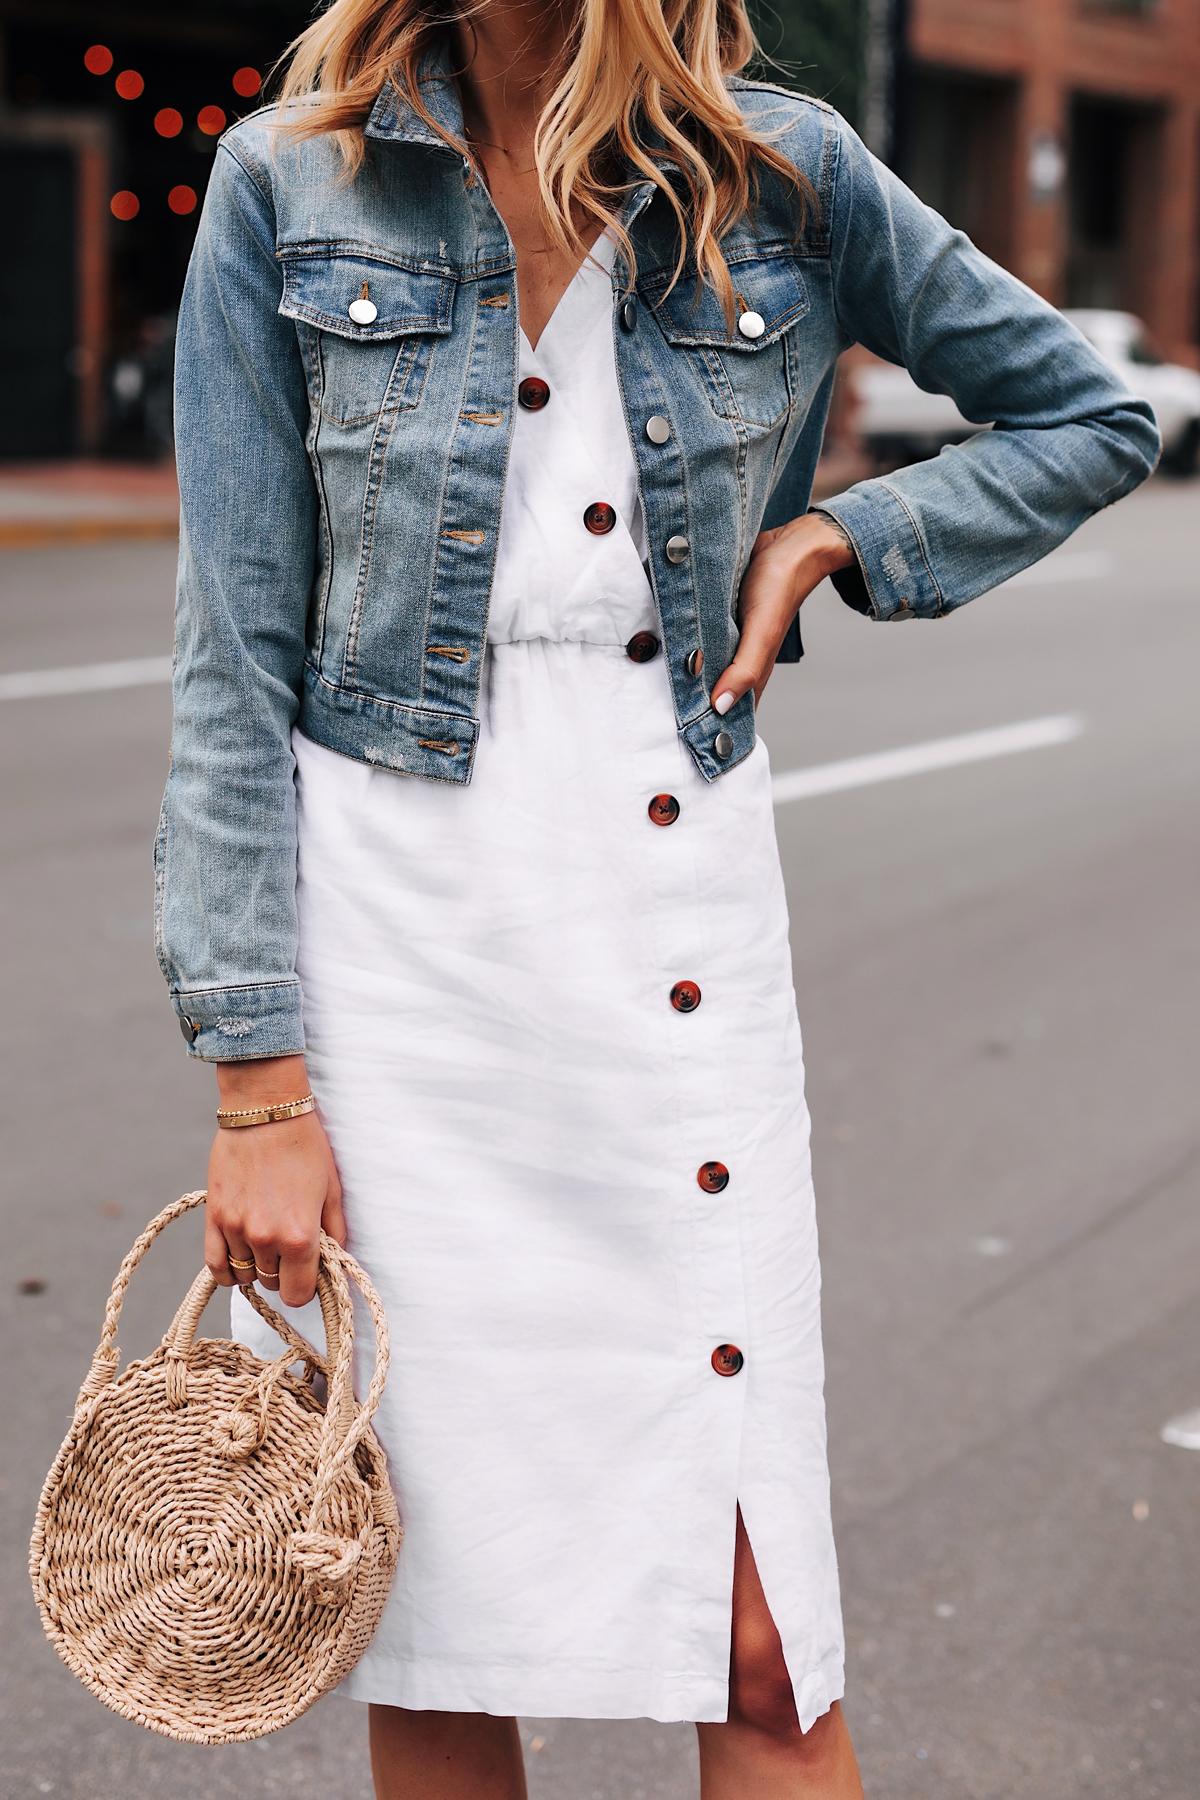 Blonde Woman Wearing Denim Jacket White Button Dress Straw Circle Handbag Fashion Jackson San Diego Fashion Blogger Street Style